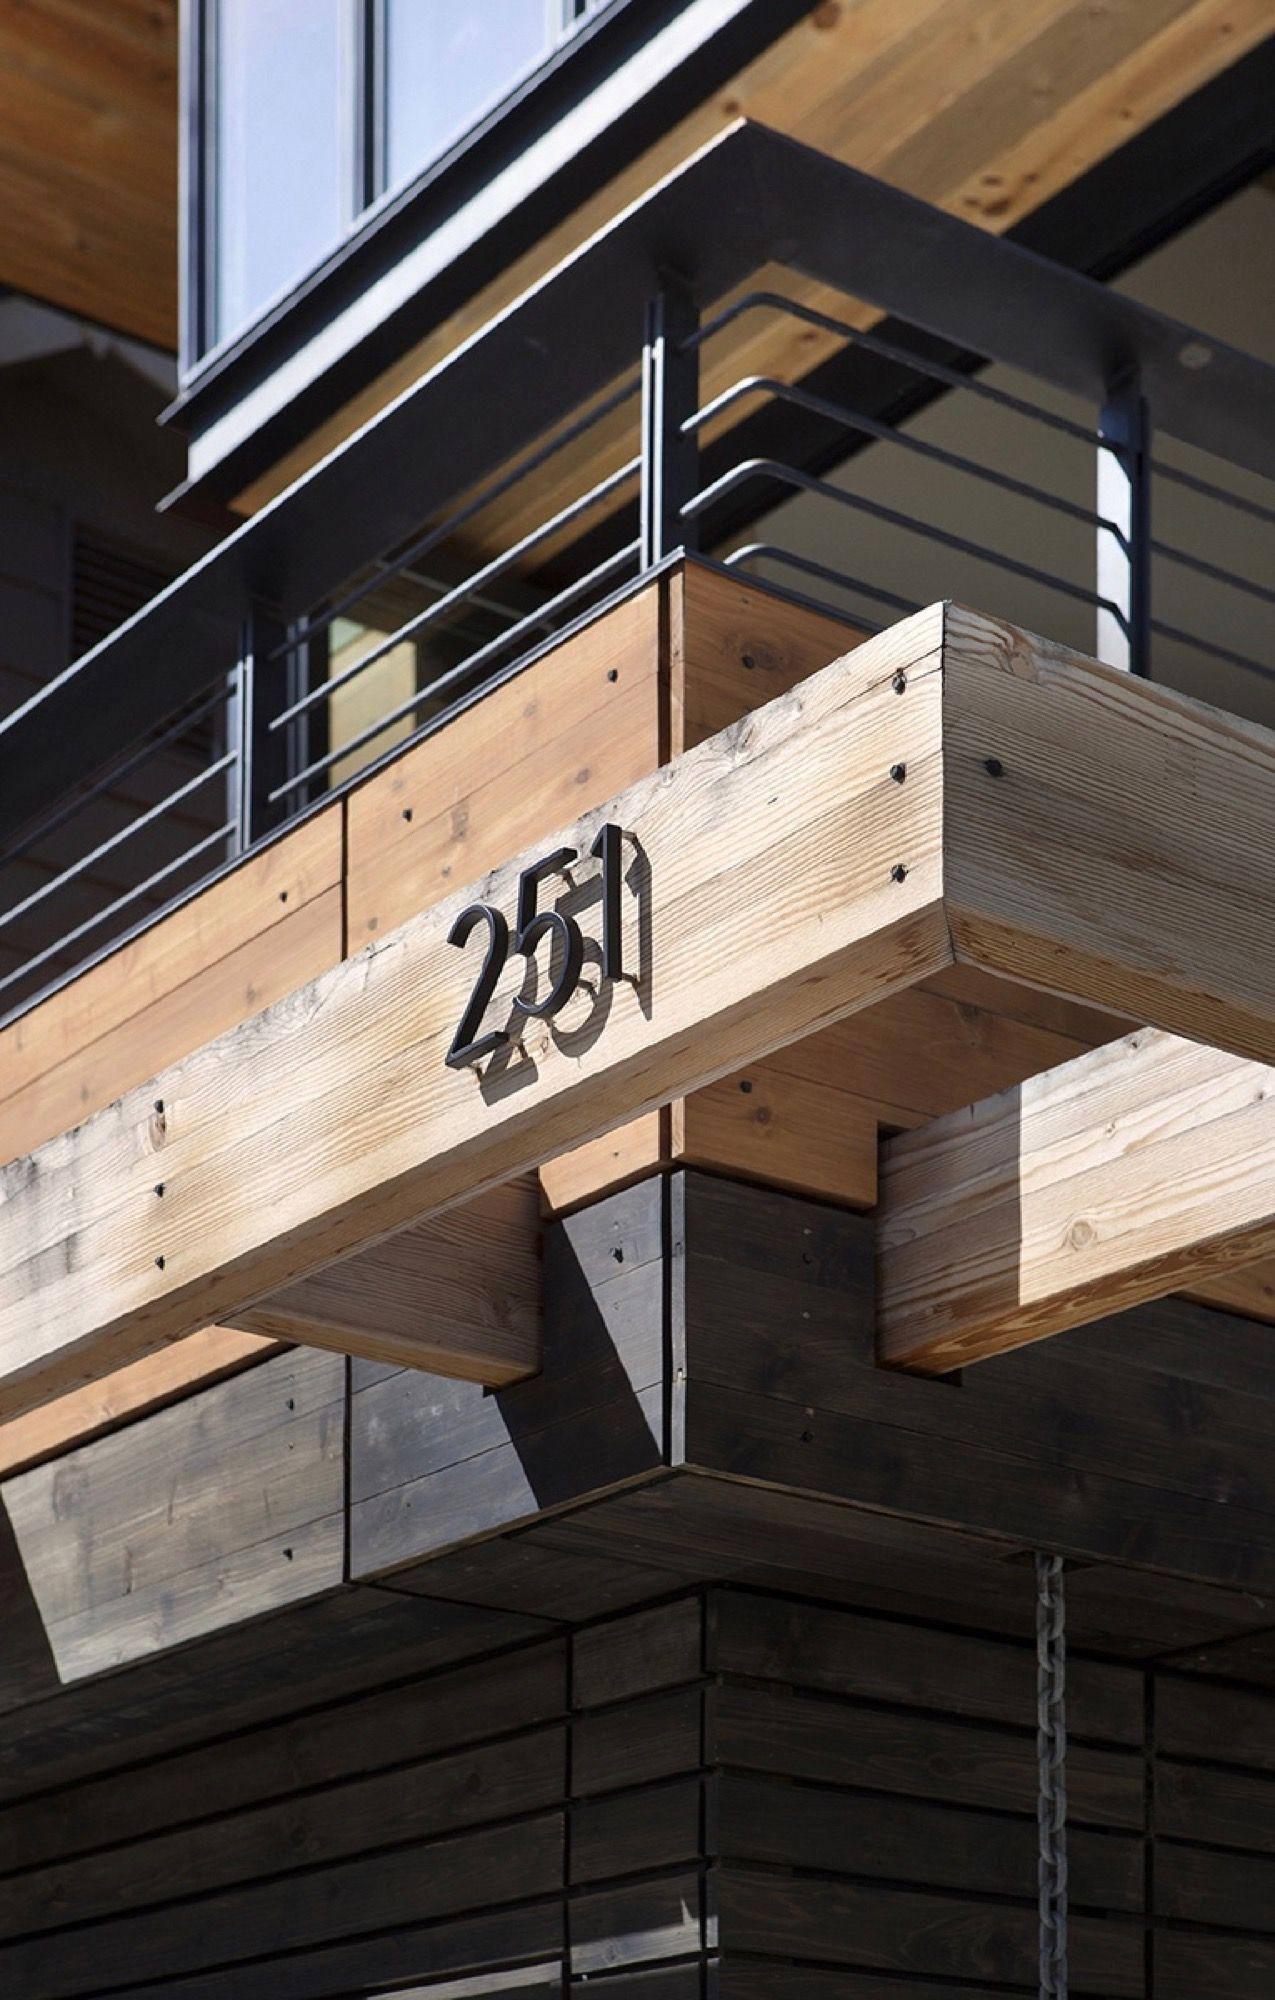 Best Narrow Escape Balcony Railing Design Deck Railing 400 x 300